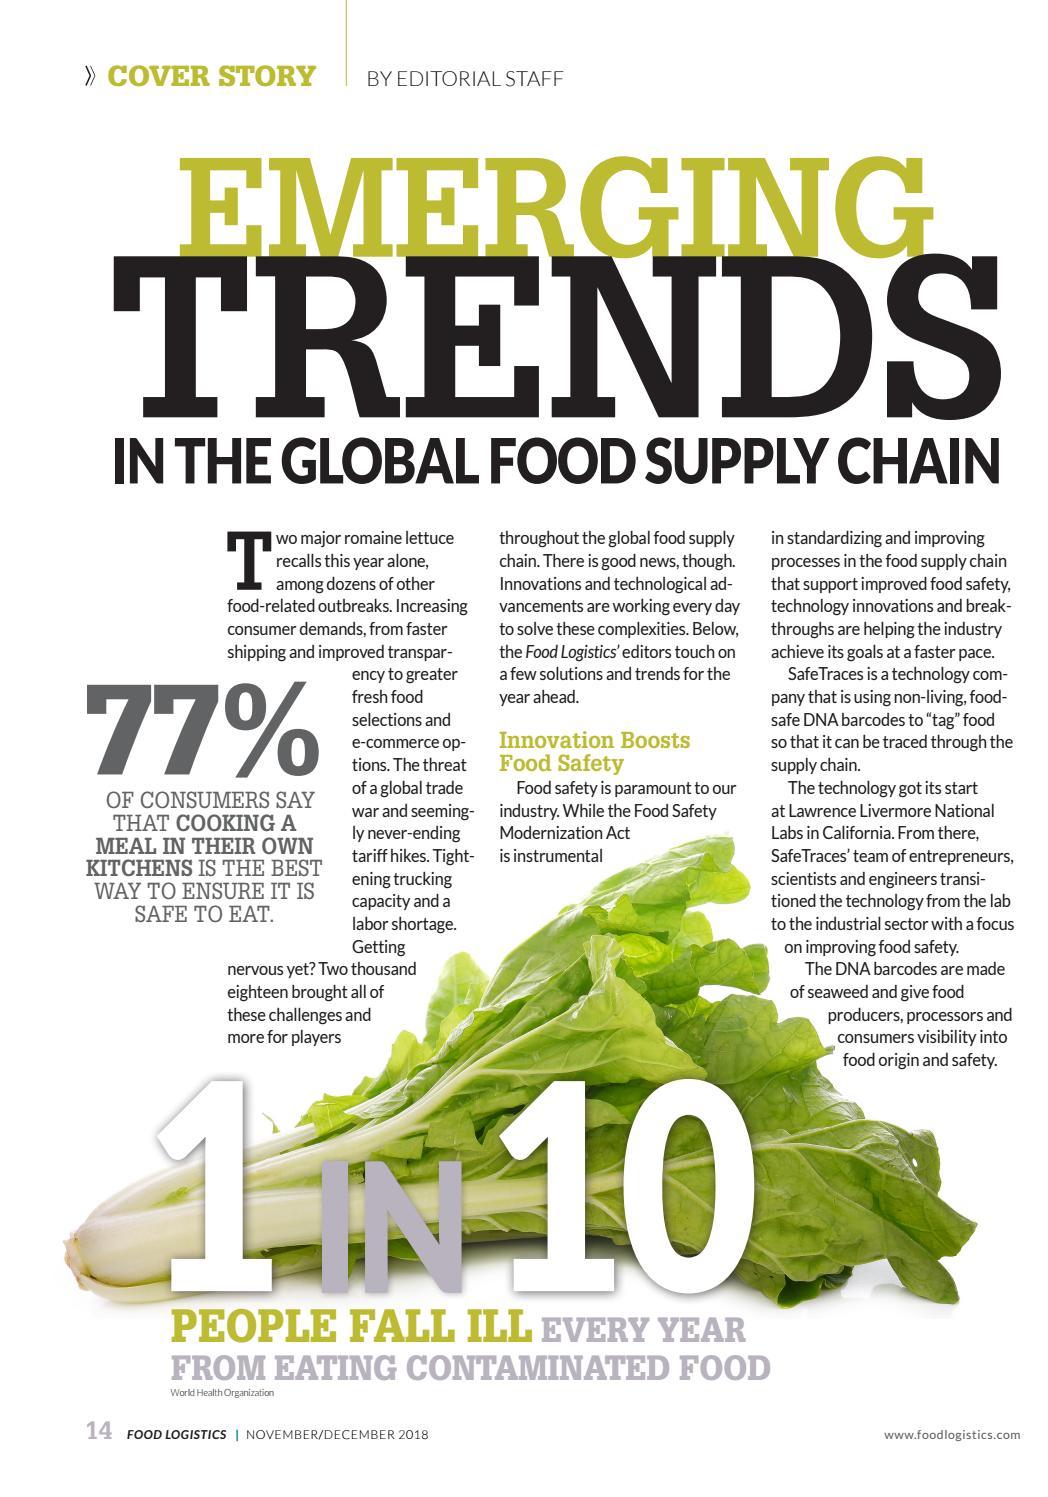 Food Logistics Nov/Dec 2018 by Supply+Demand Chain/Food